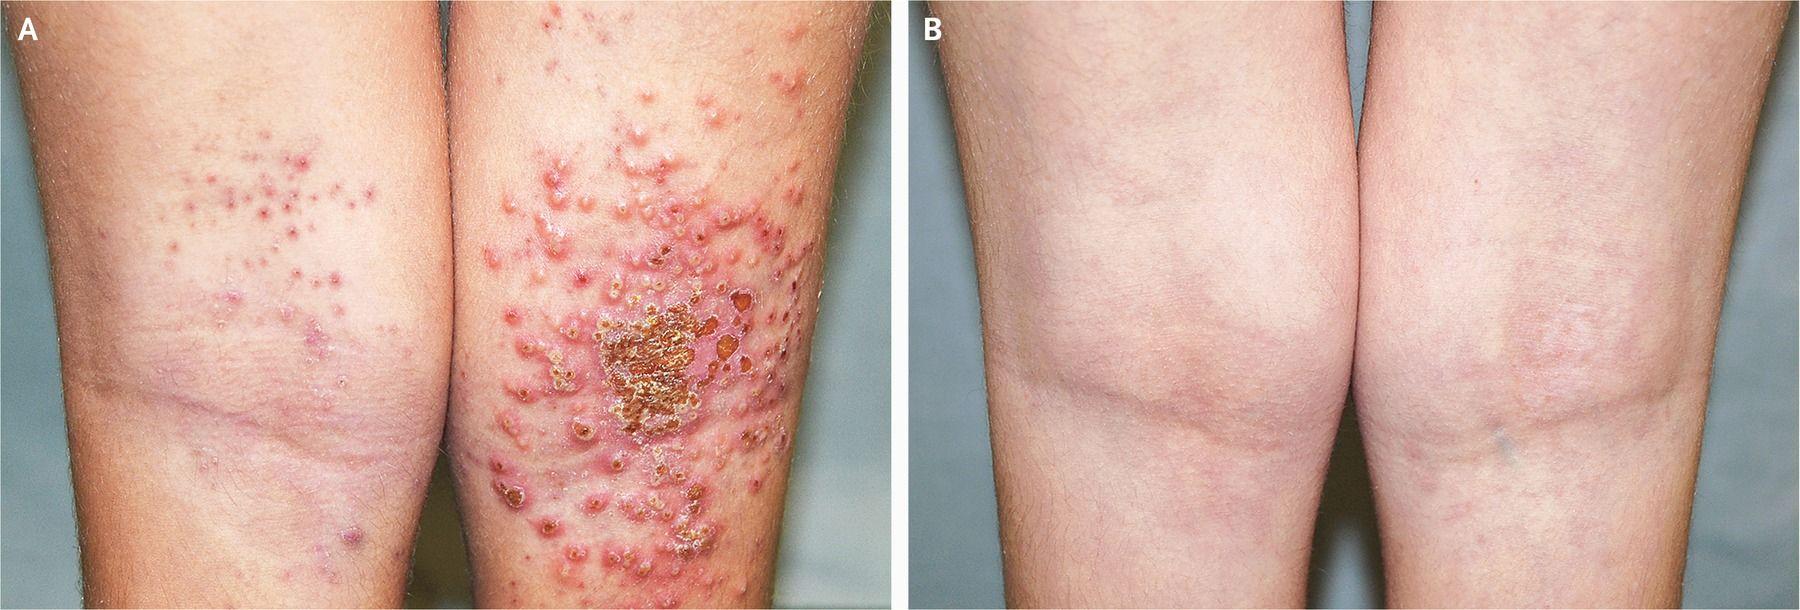 Eczema Herpeticum An 8yearold girl with atopic